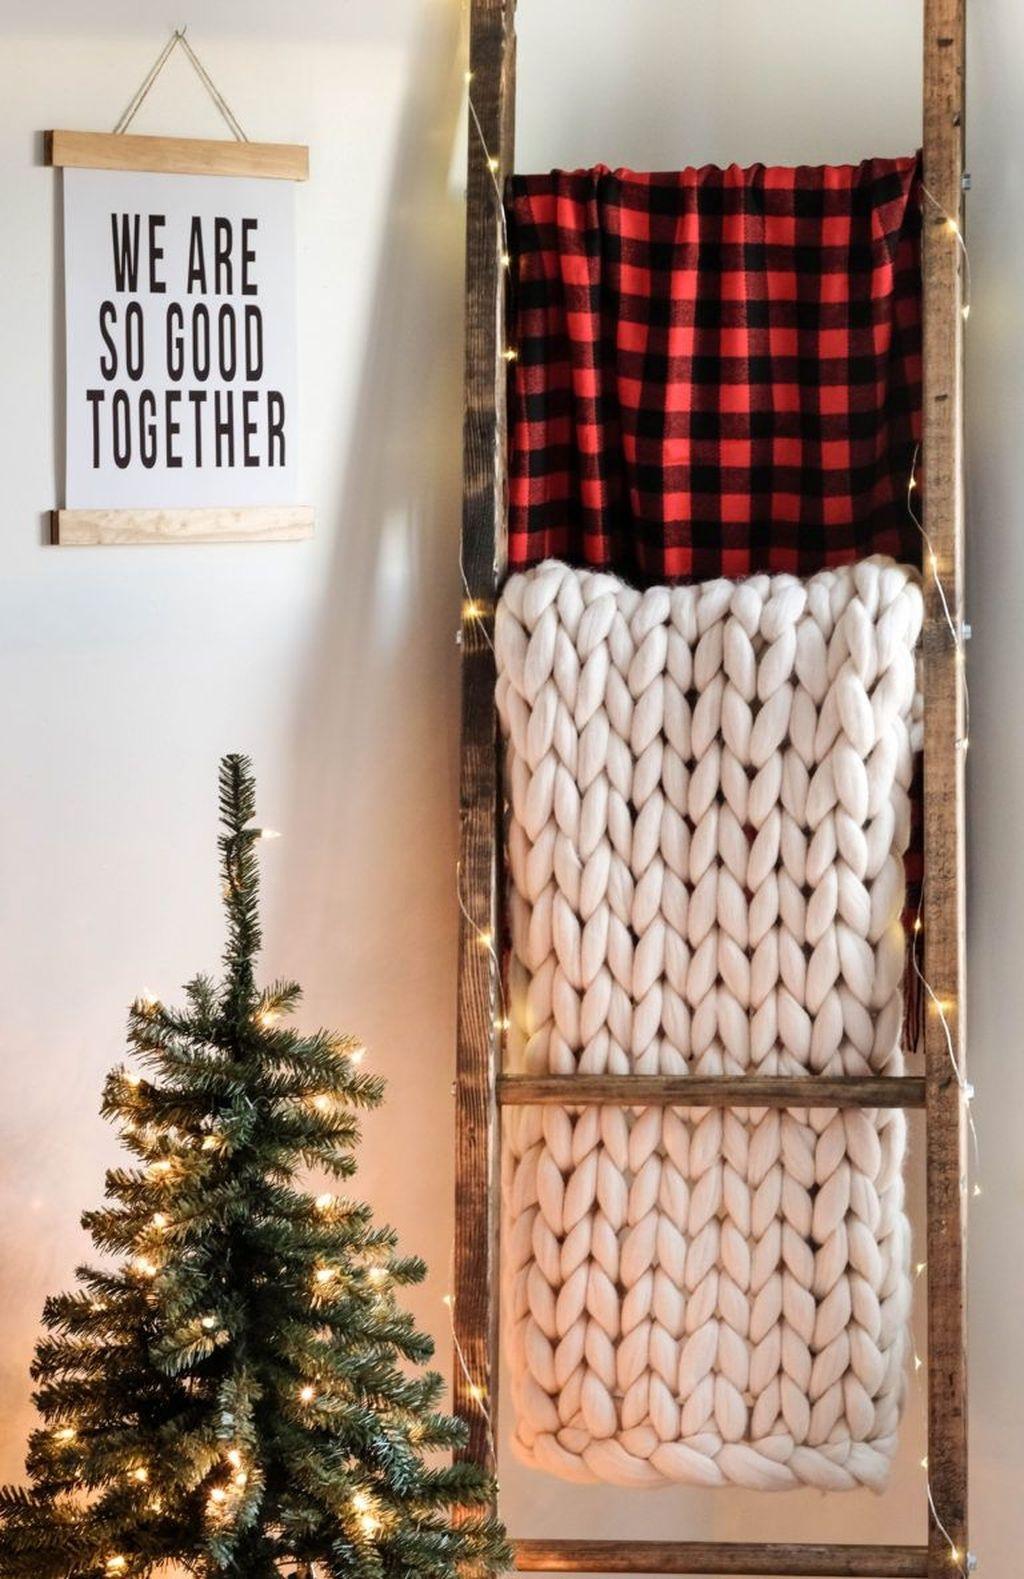 Unordinary Christmas Home Decor Ideas 35